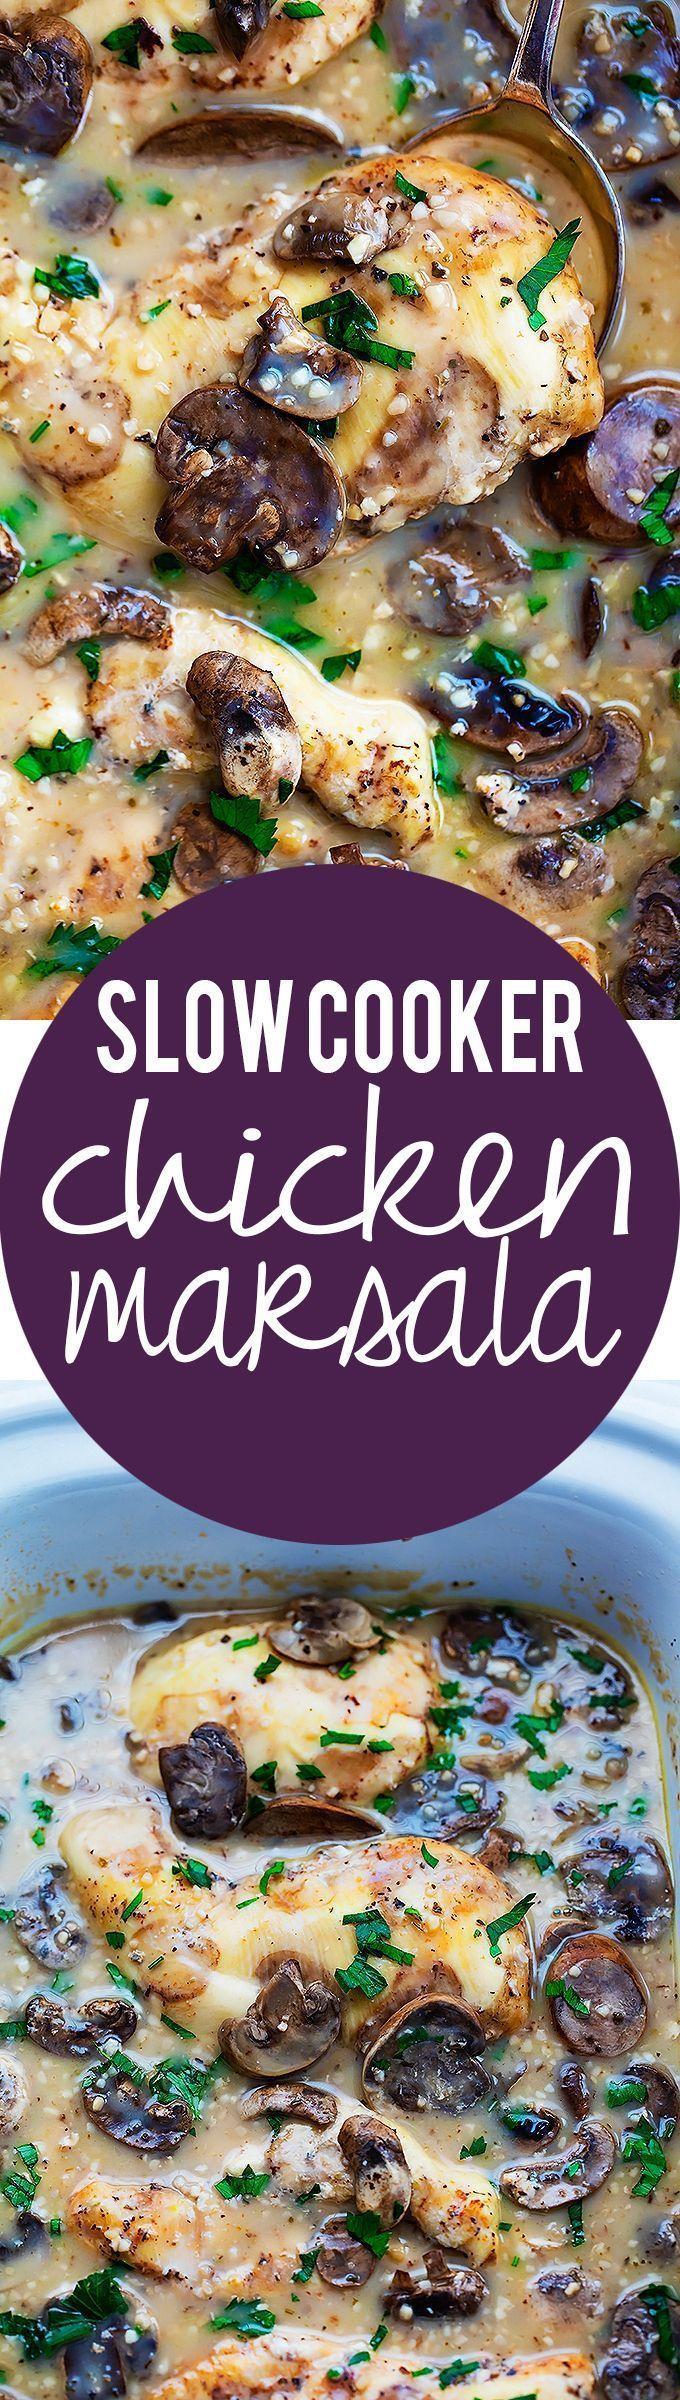 Slow Cooker Chicken Marsala | Creme de la Crumb